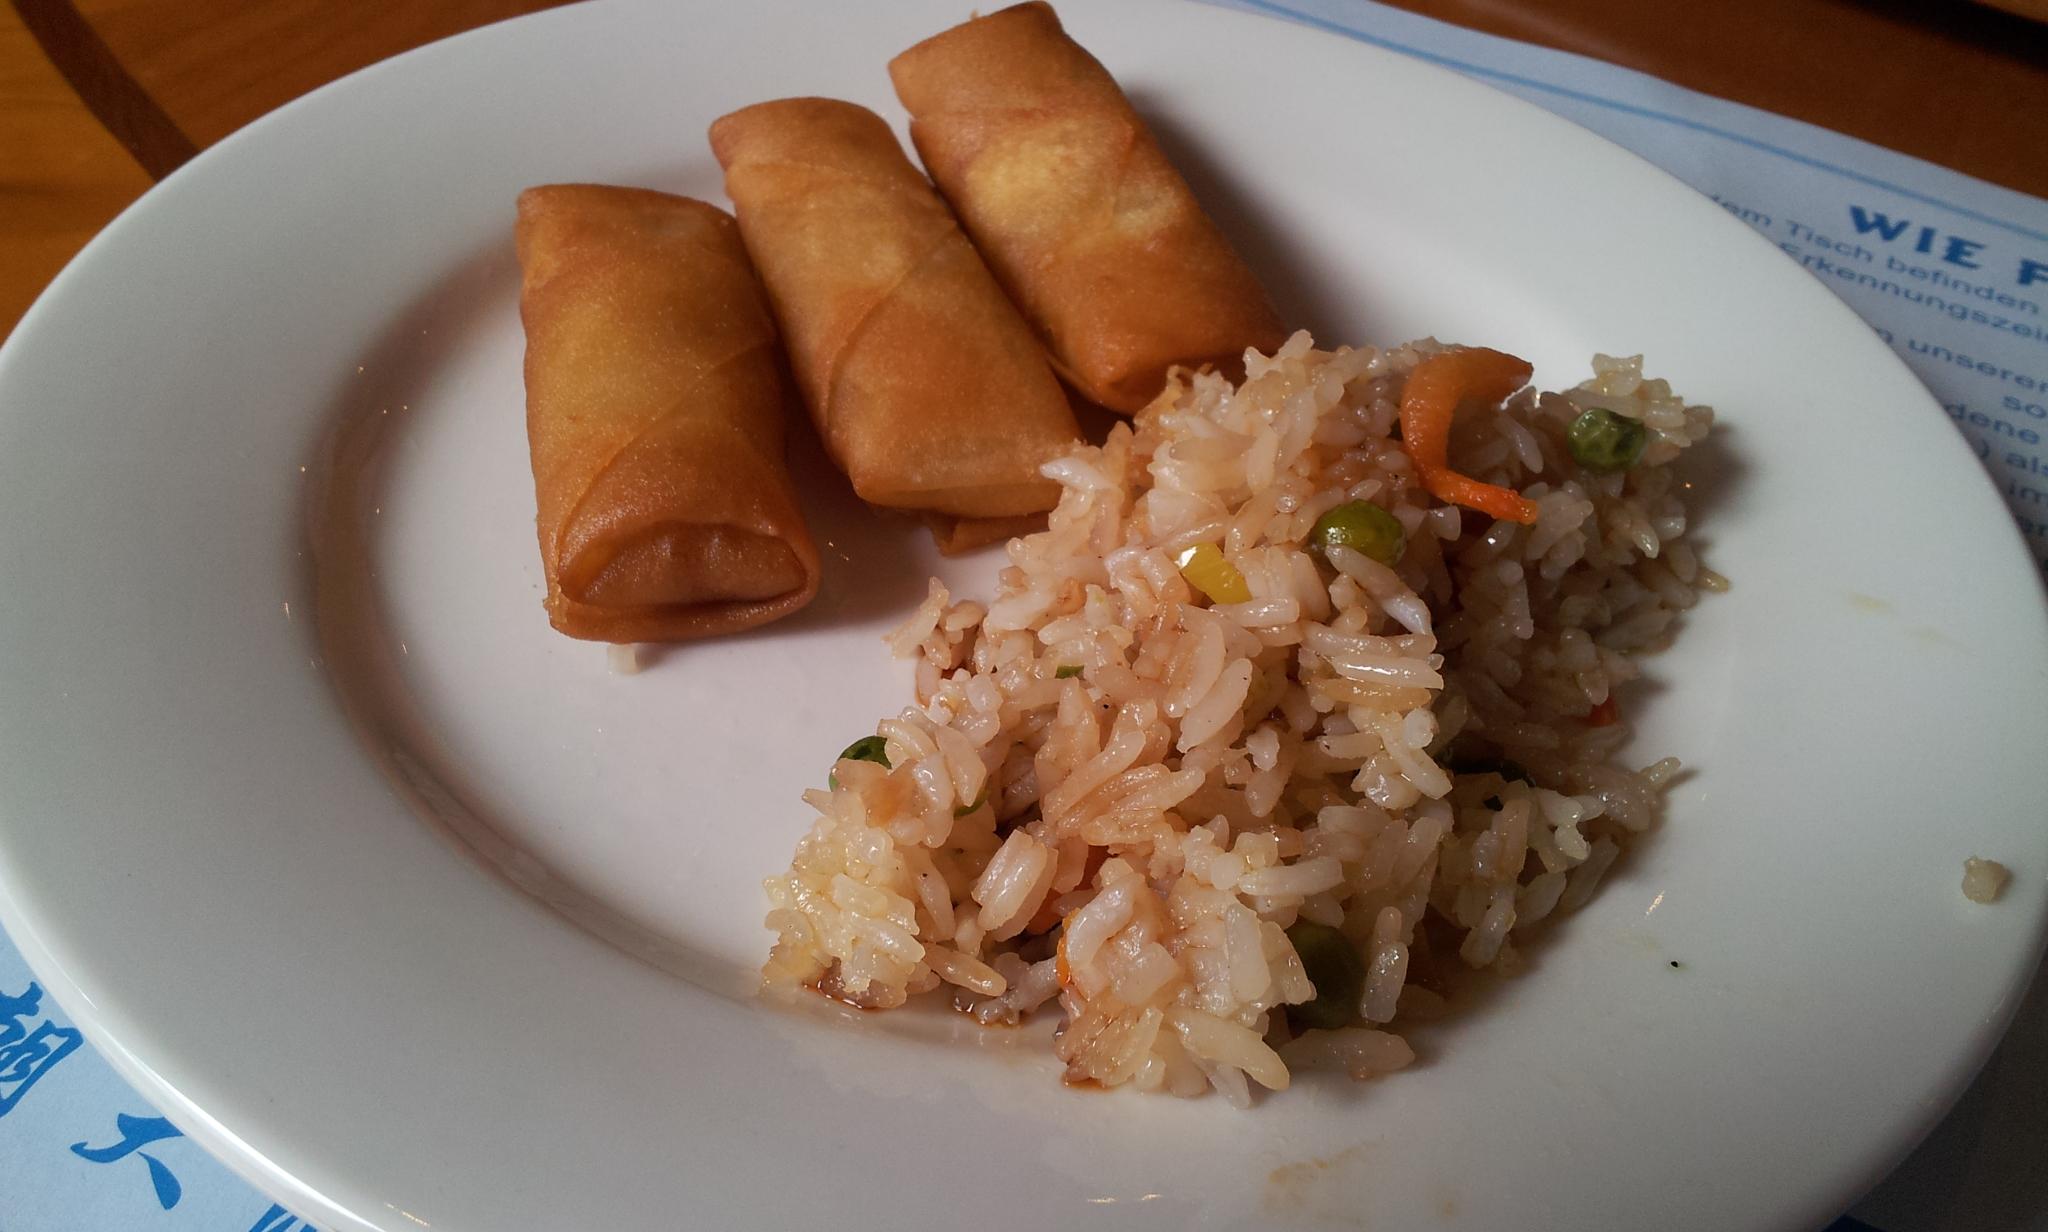 https://foodloader.net/Holz_2012-11-02_Dynasty_5_gebratener_Reis_mit_Minifruehlingsrollen.jpg